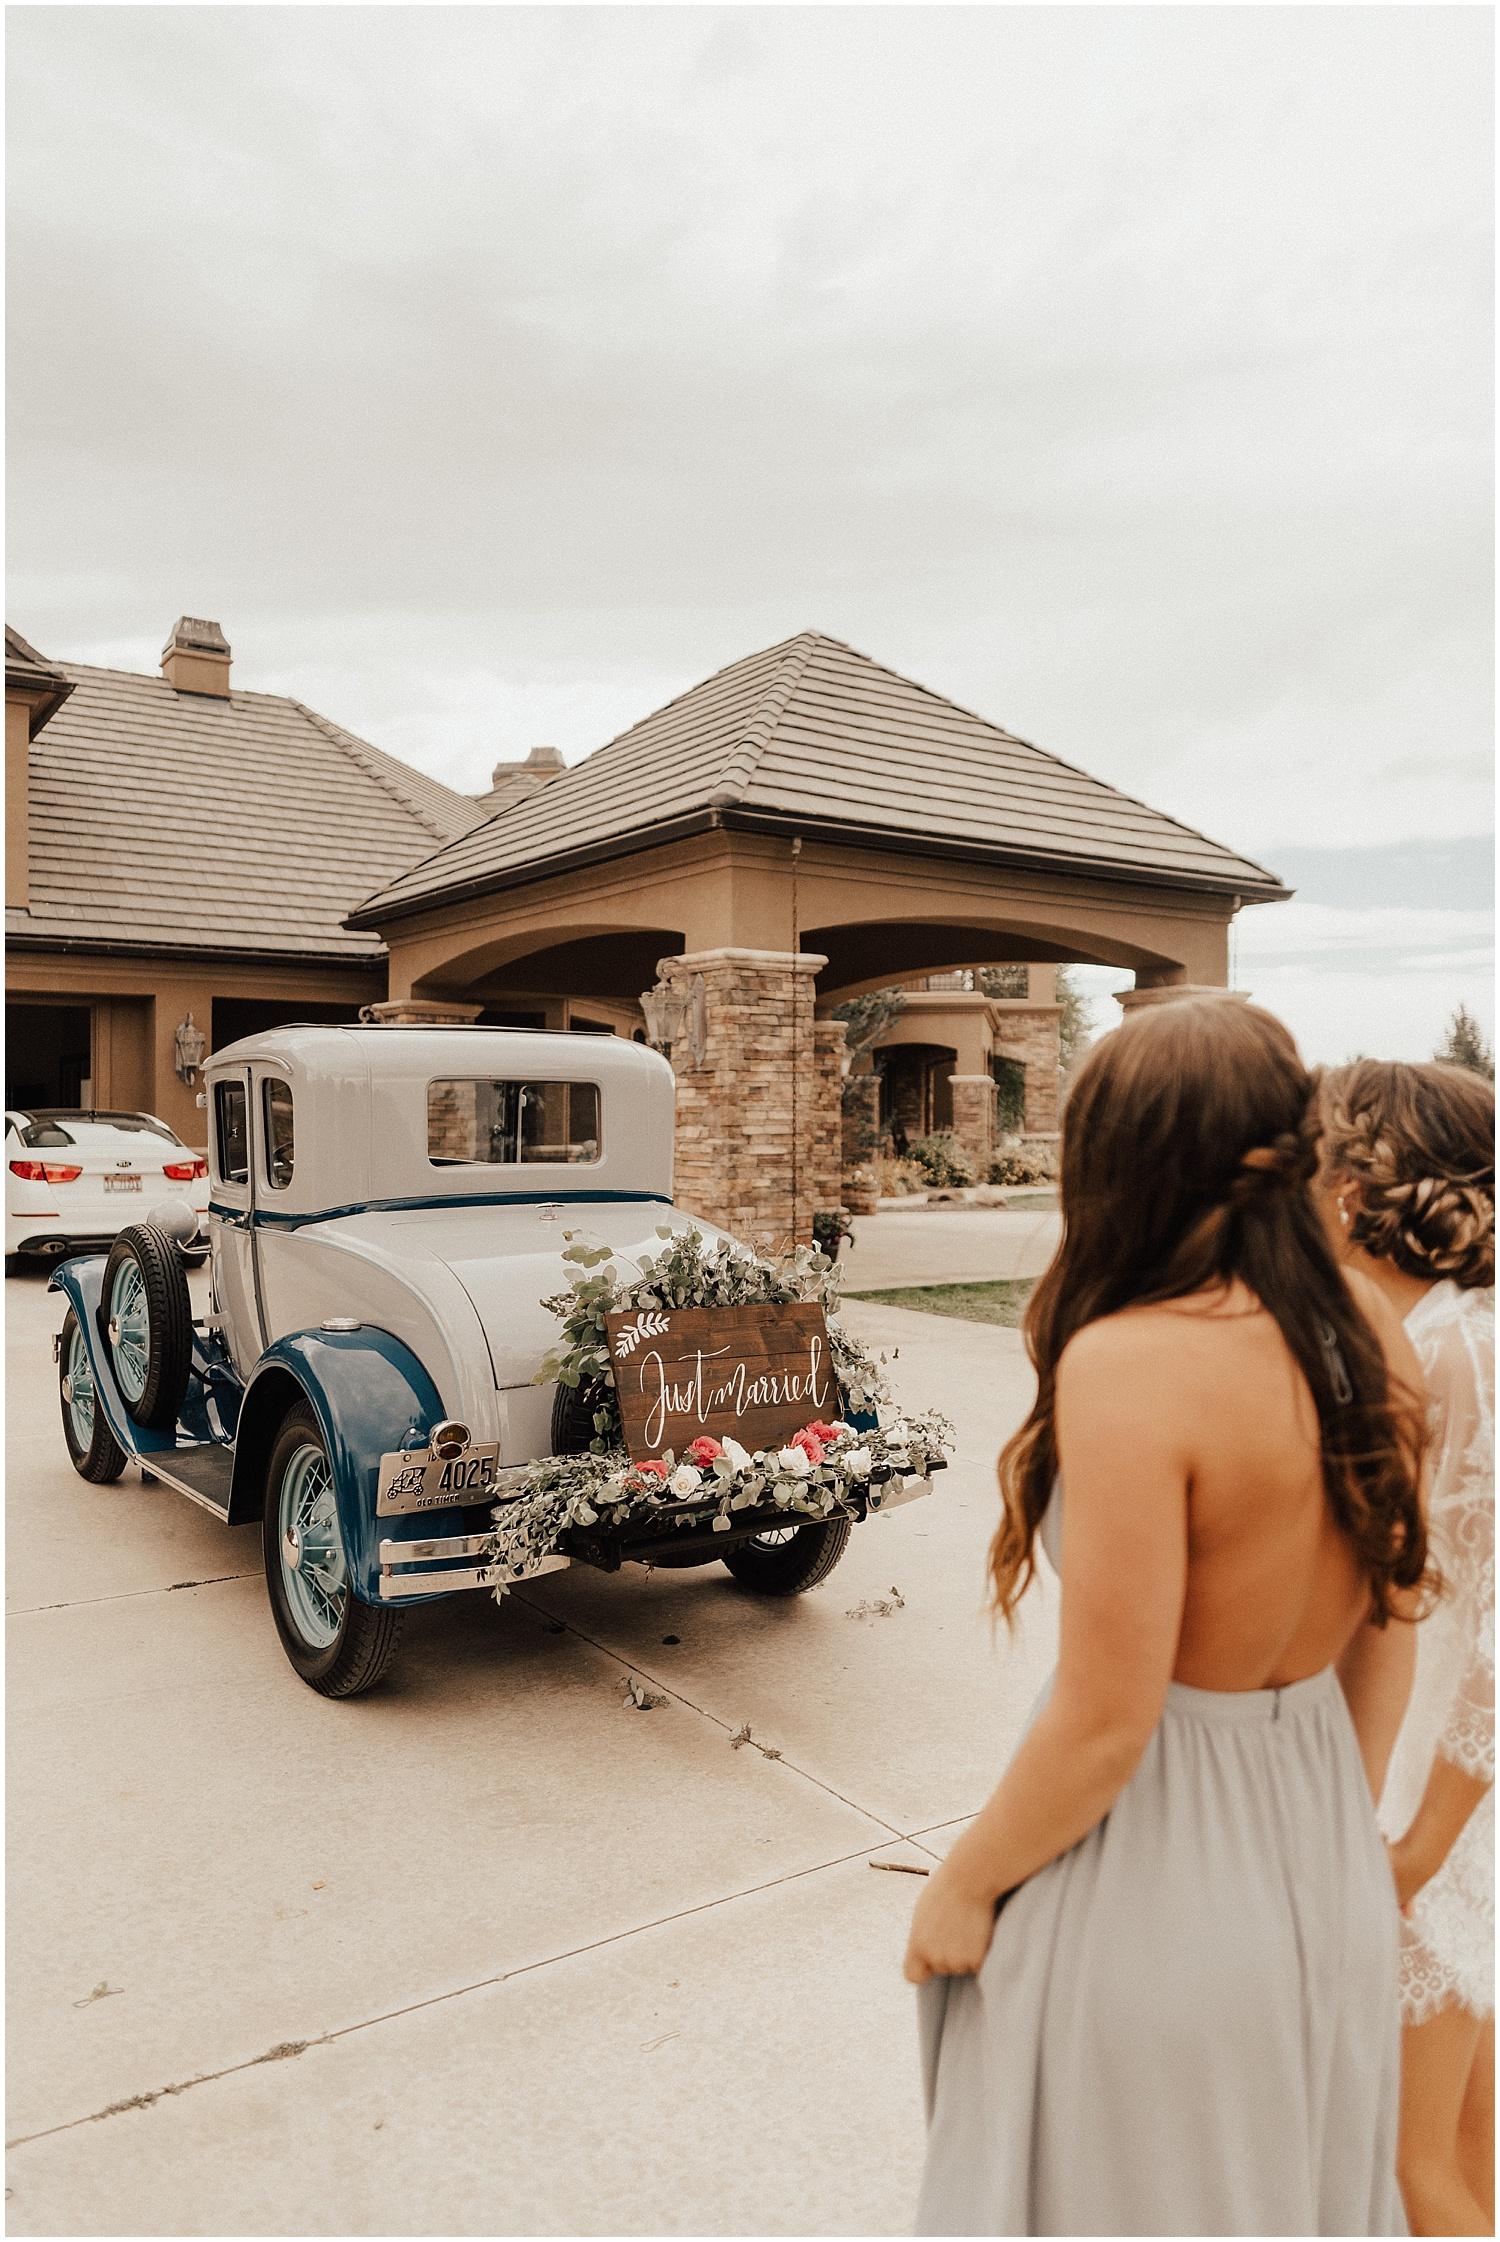 whimsical-summer-wedding-boise-idaho-las-vegas-bride63.jpg